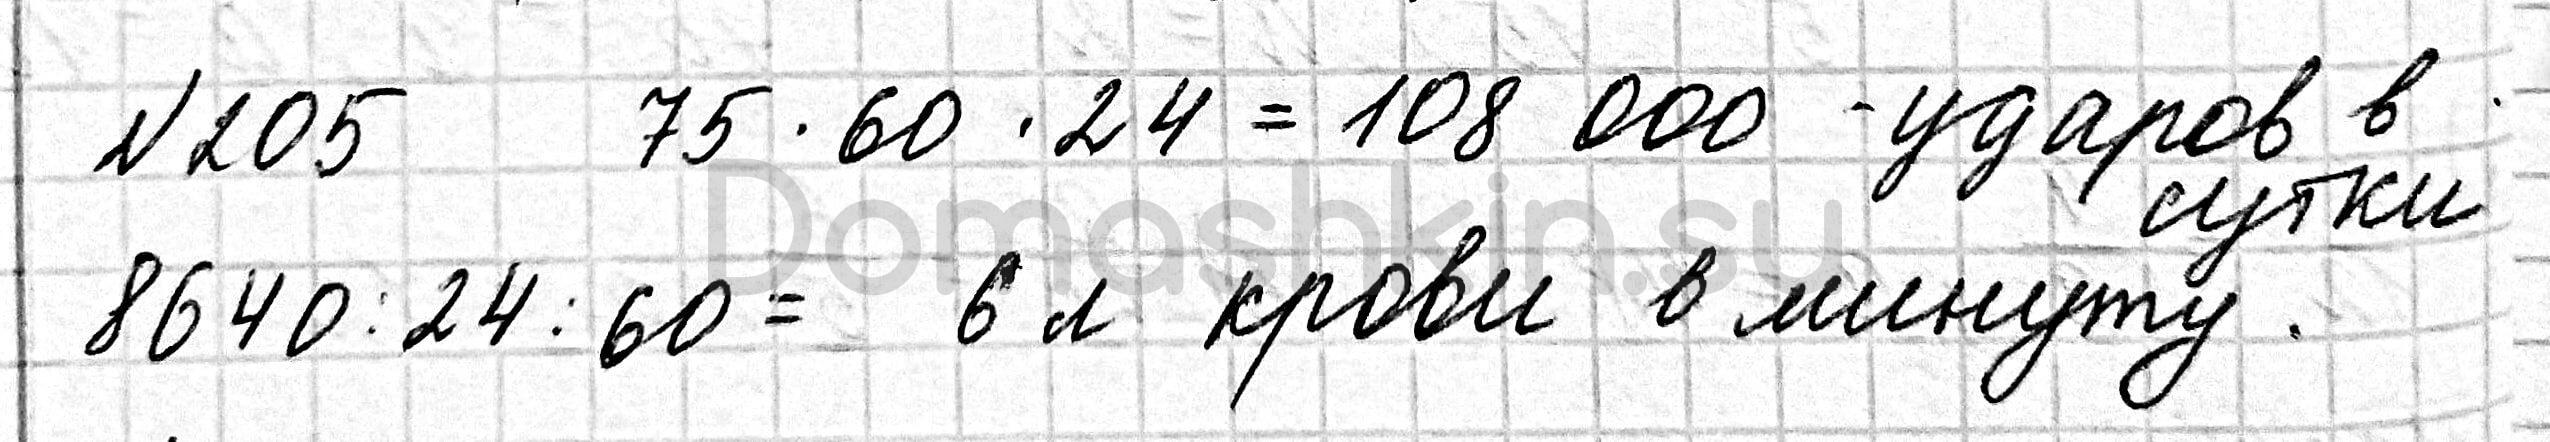 Математика 6 класс учебник Мерзляк номер 205 решение